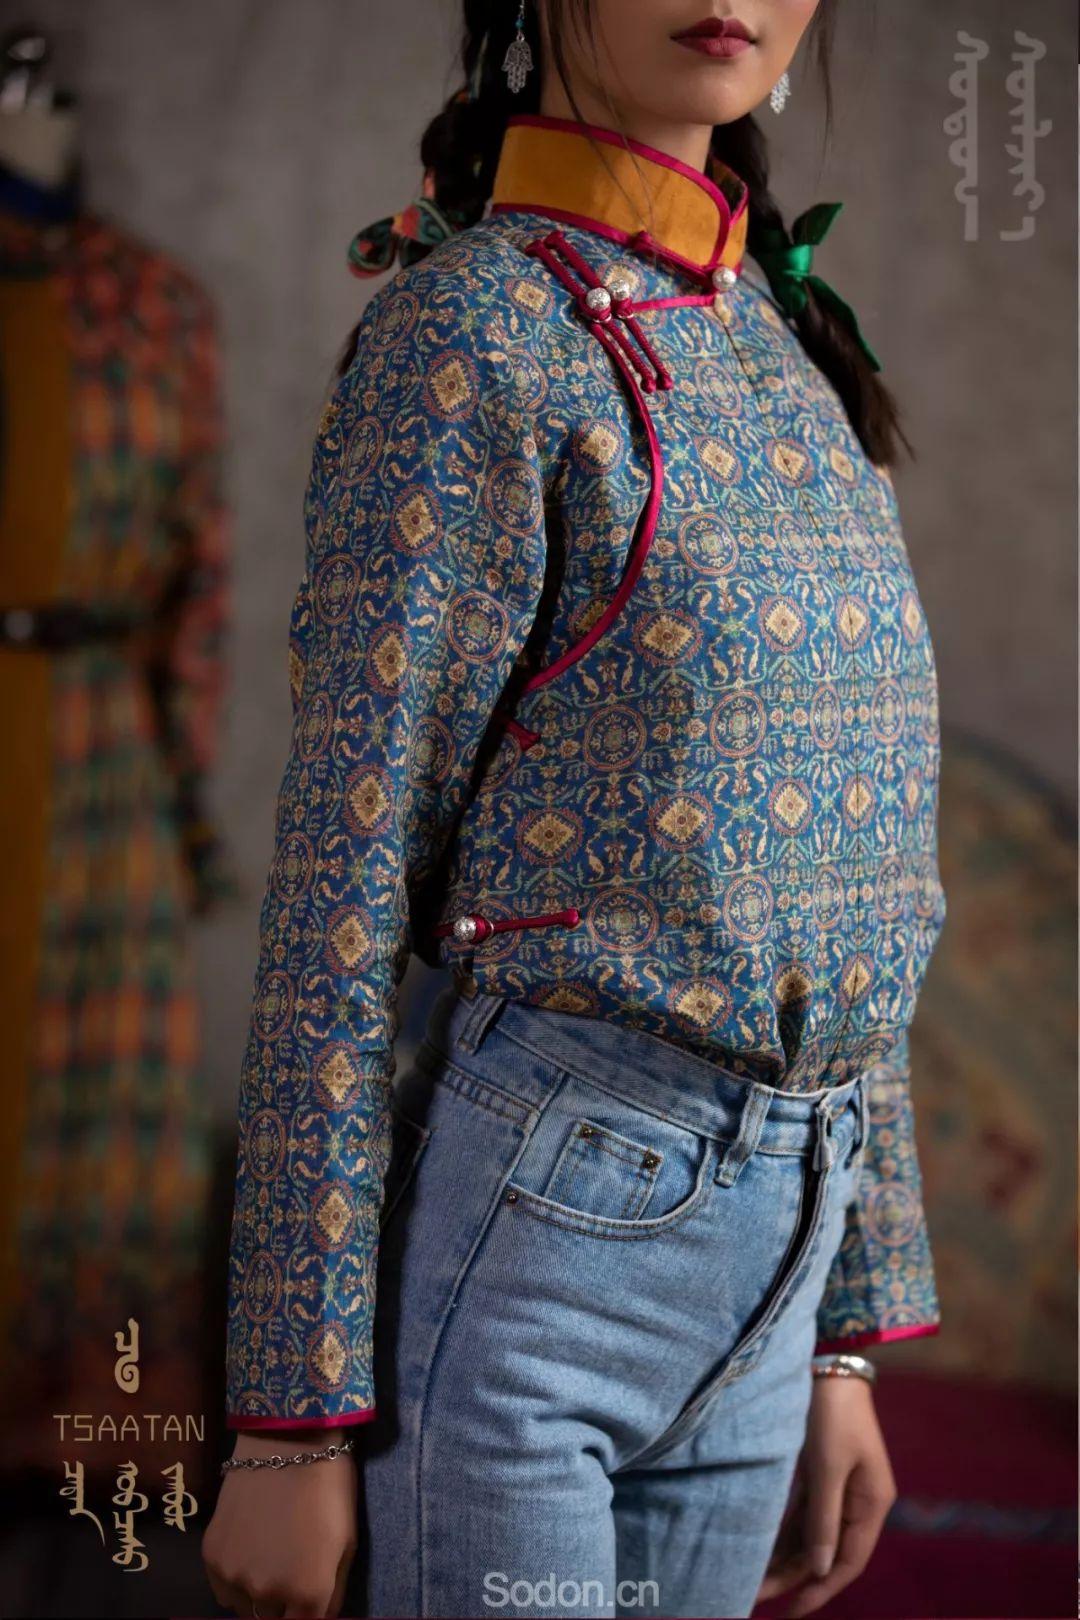 TSAATAN蒙古时装 2019夏季新款首发 第4张